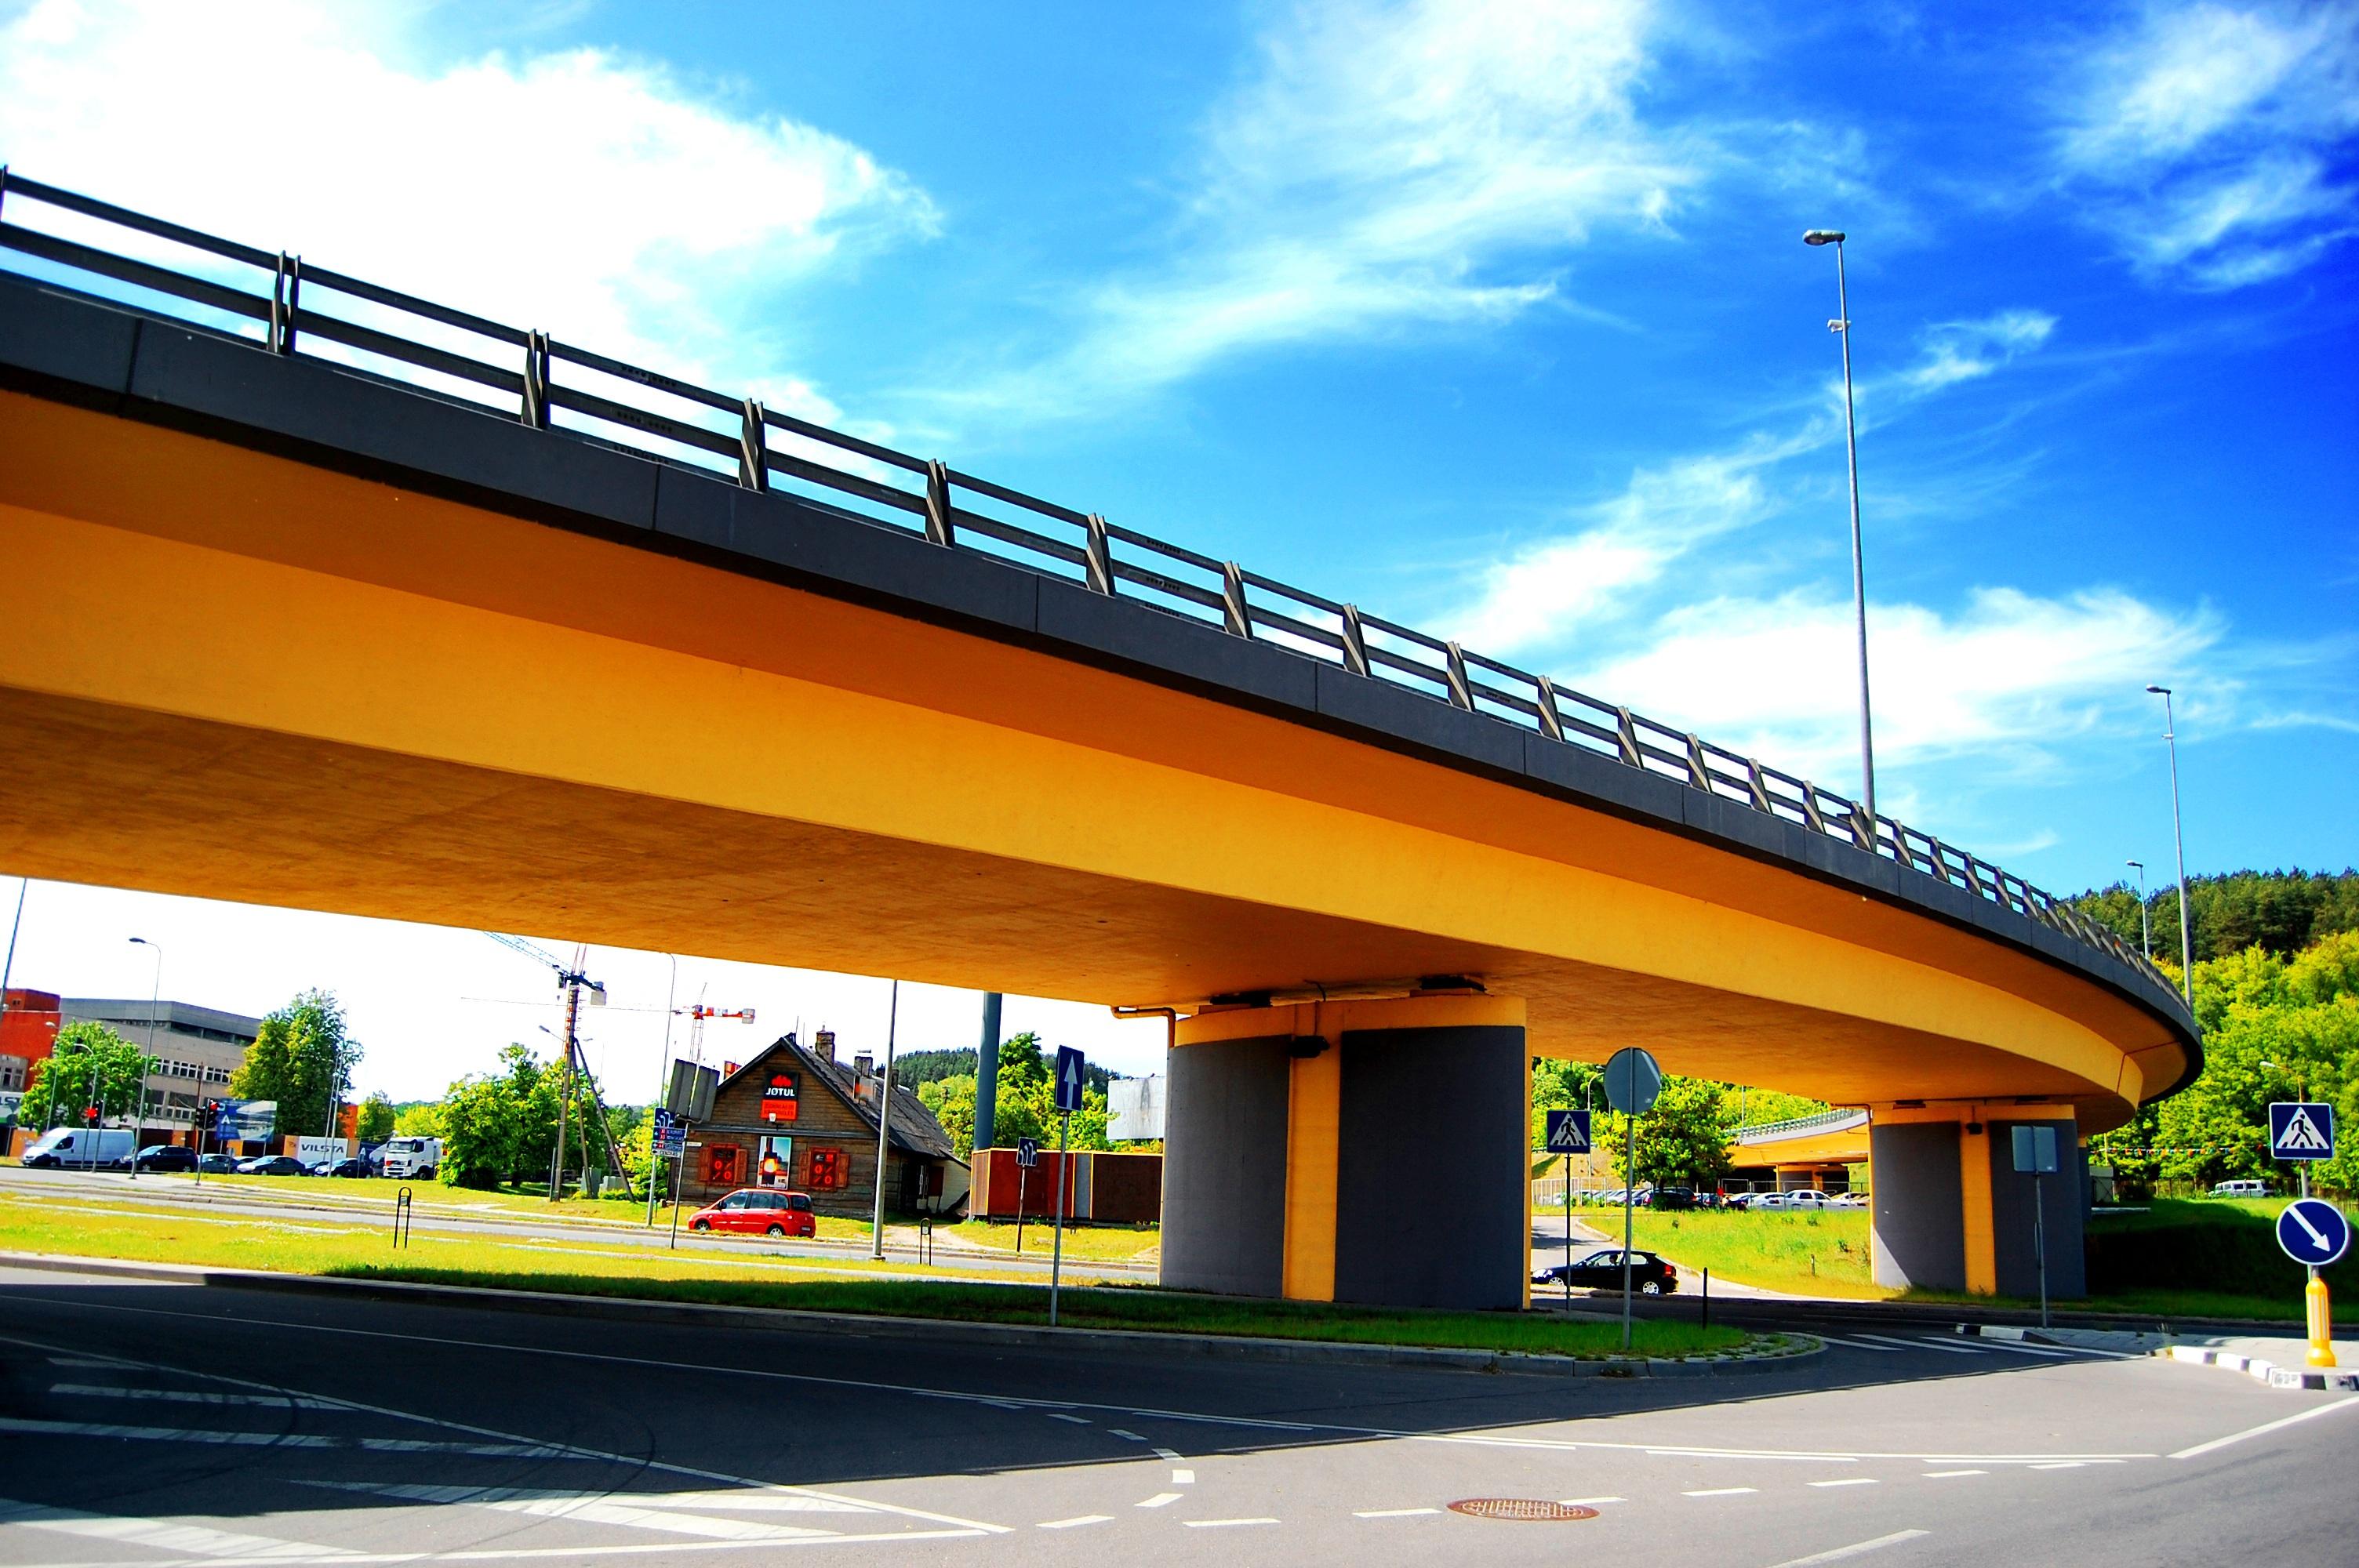 """InfoEra"" ir ""Civilpoint"" bendradarbiaus vystant BIM sprendimus infrastruktūrai"